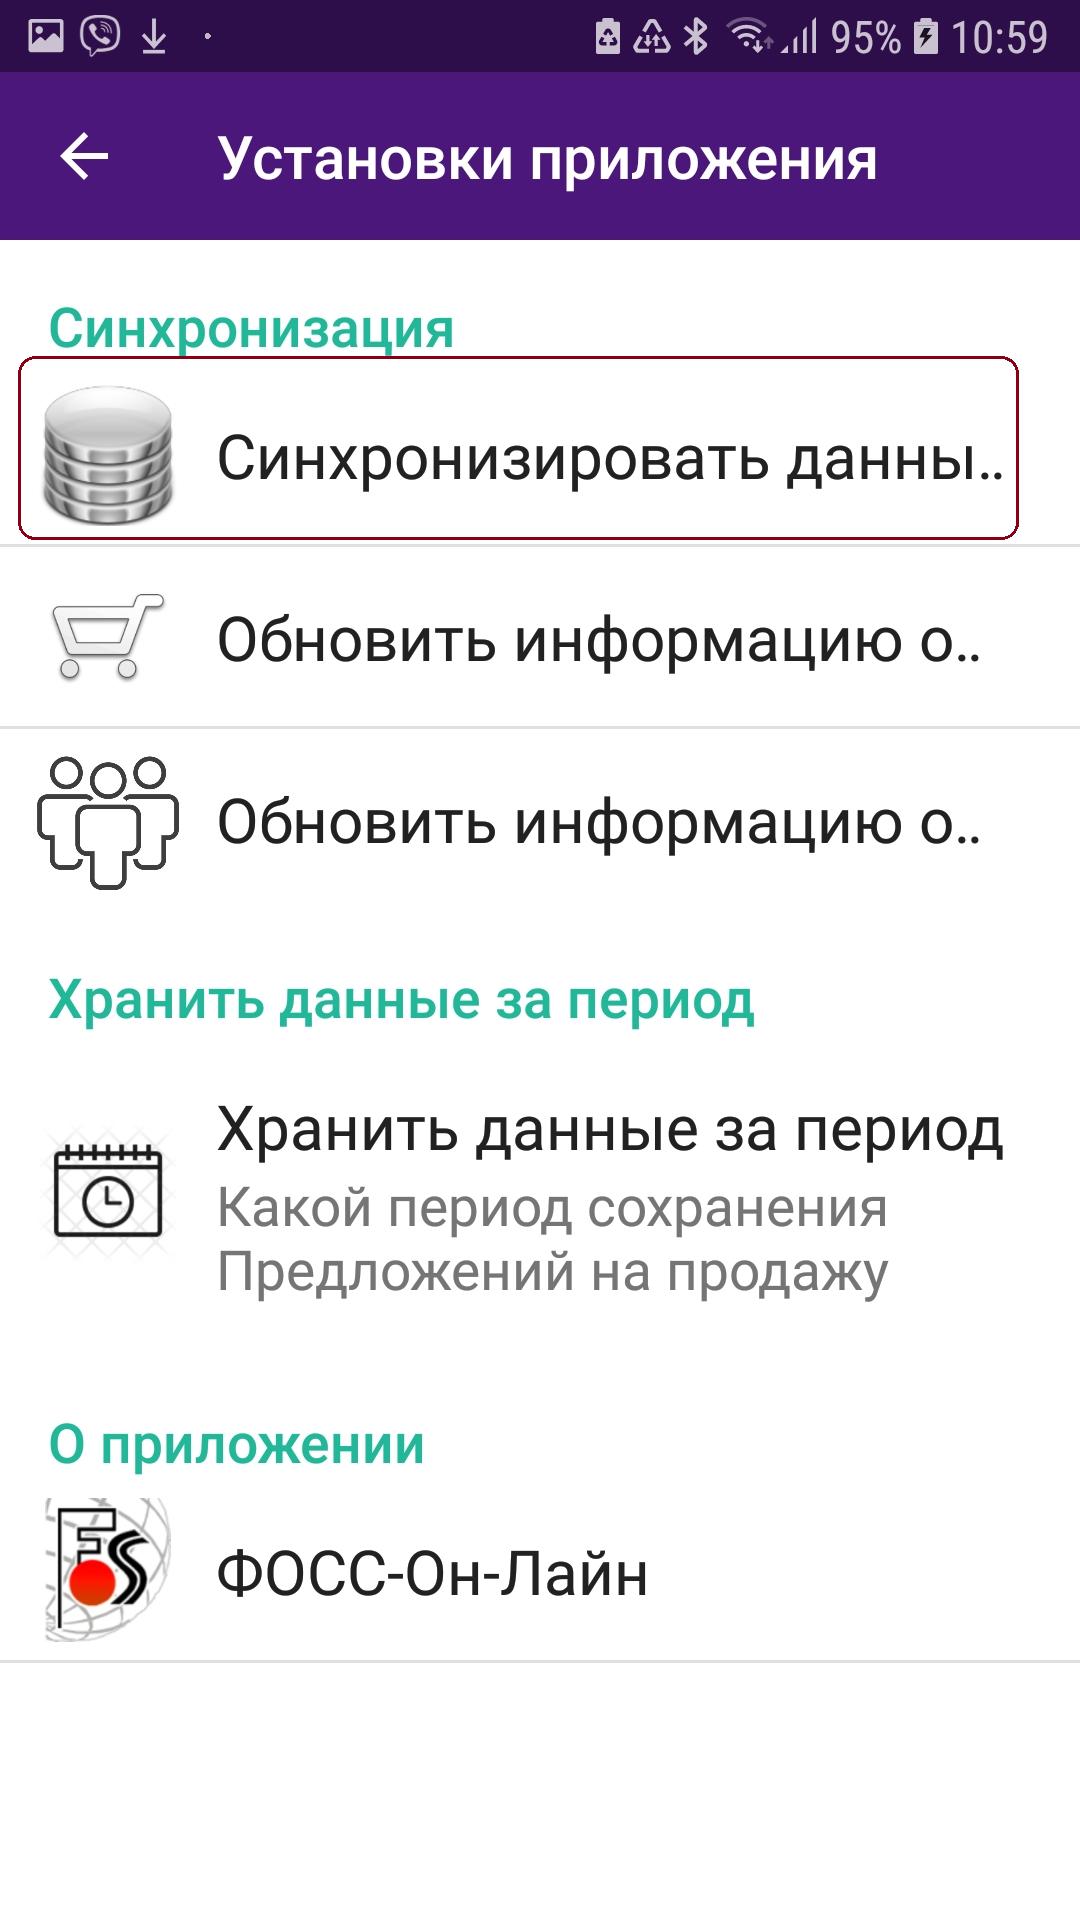 Синхронизация данных по Заказам продаж